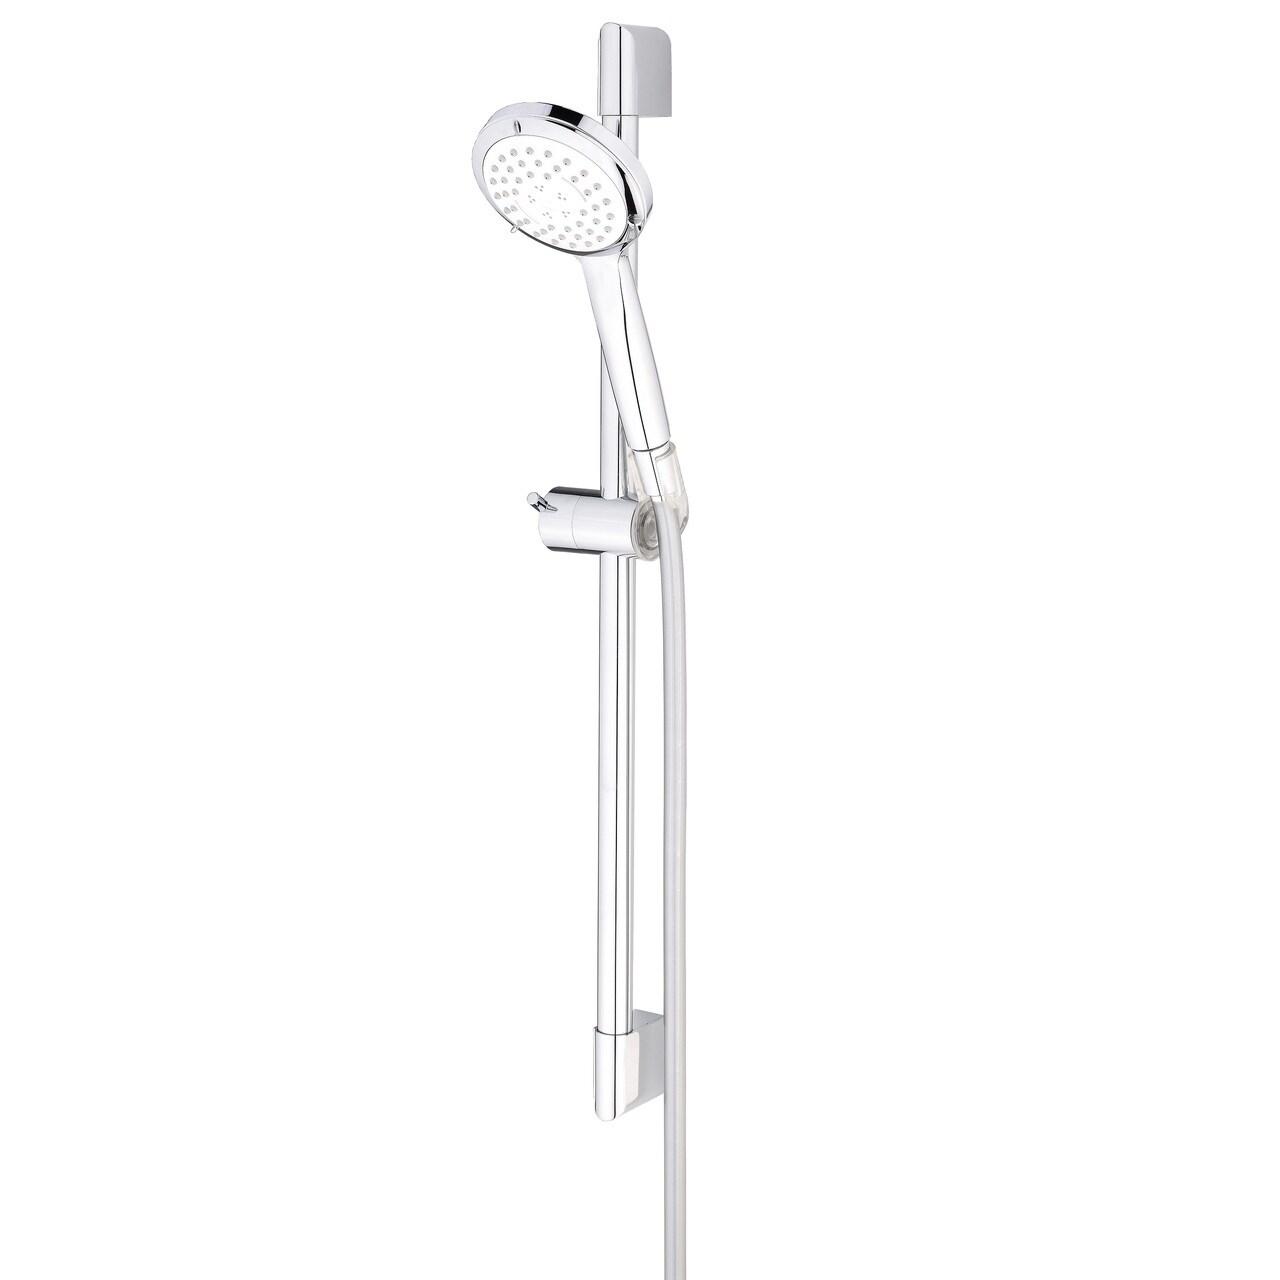 Delvac Massage Shower Head Kit 3 Spray Orta No 6 With Slide Bar